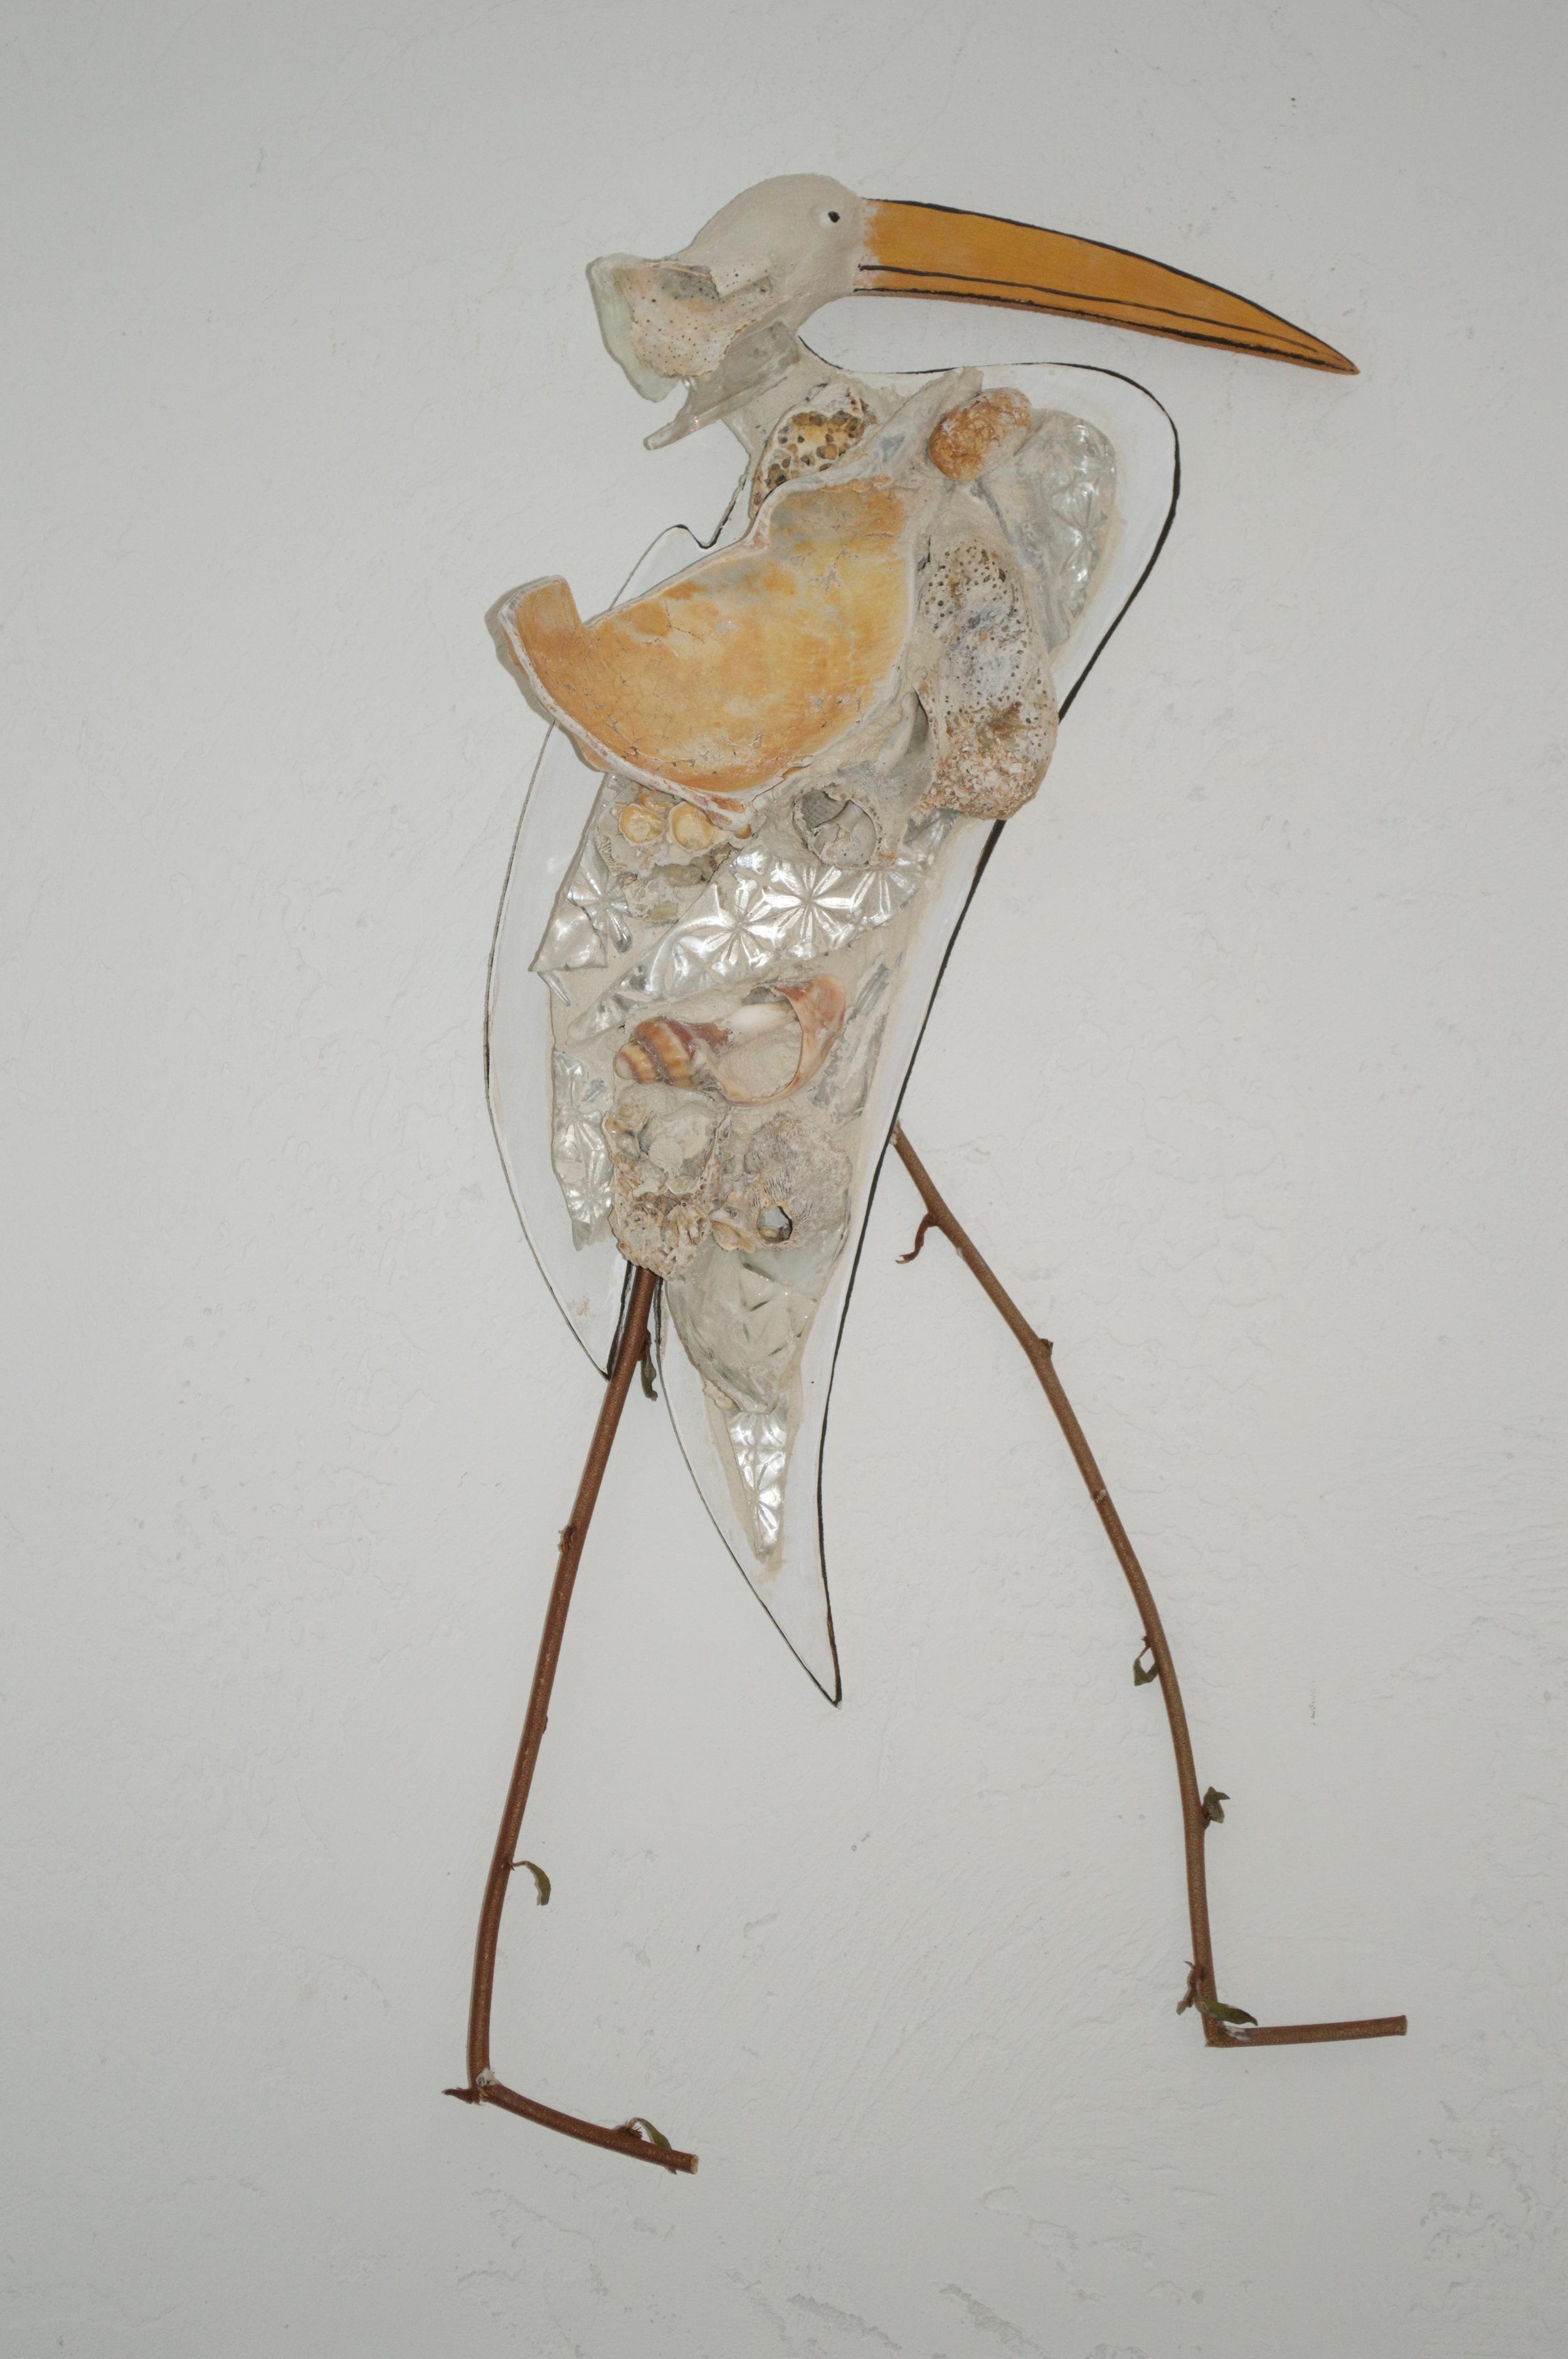 "Beach Art - Egret - wood, glass, shells, twigs - sm. 9"" x 20"", $58, large 11"" x 22"", $85"